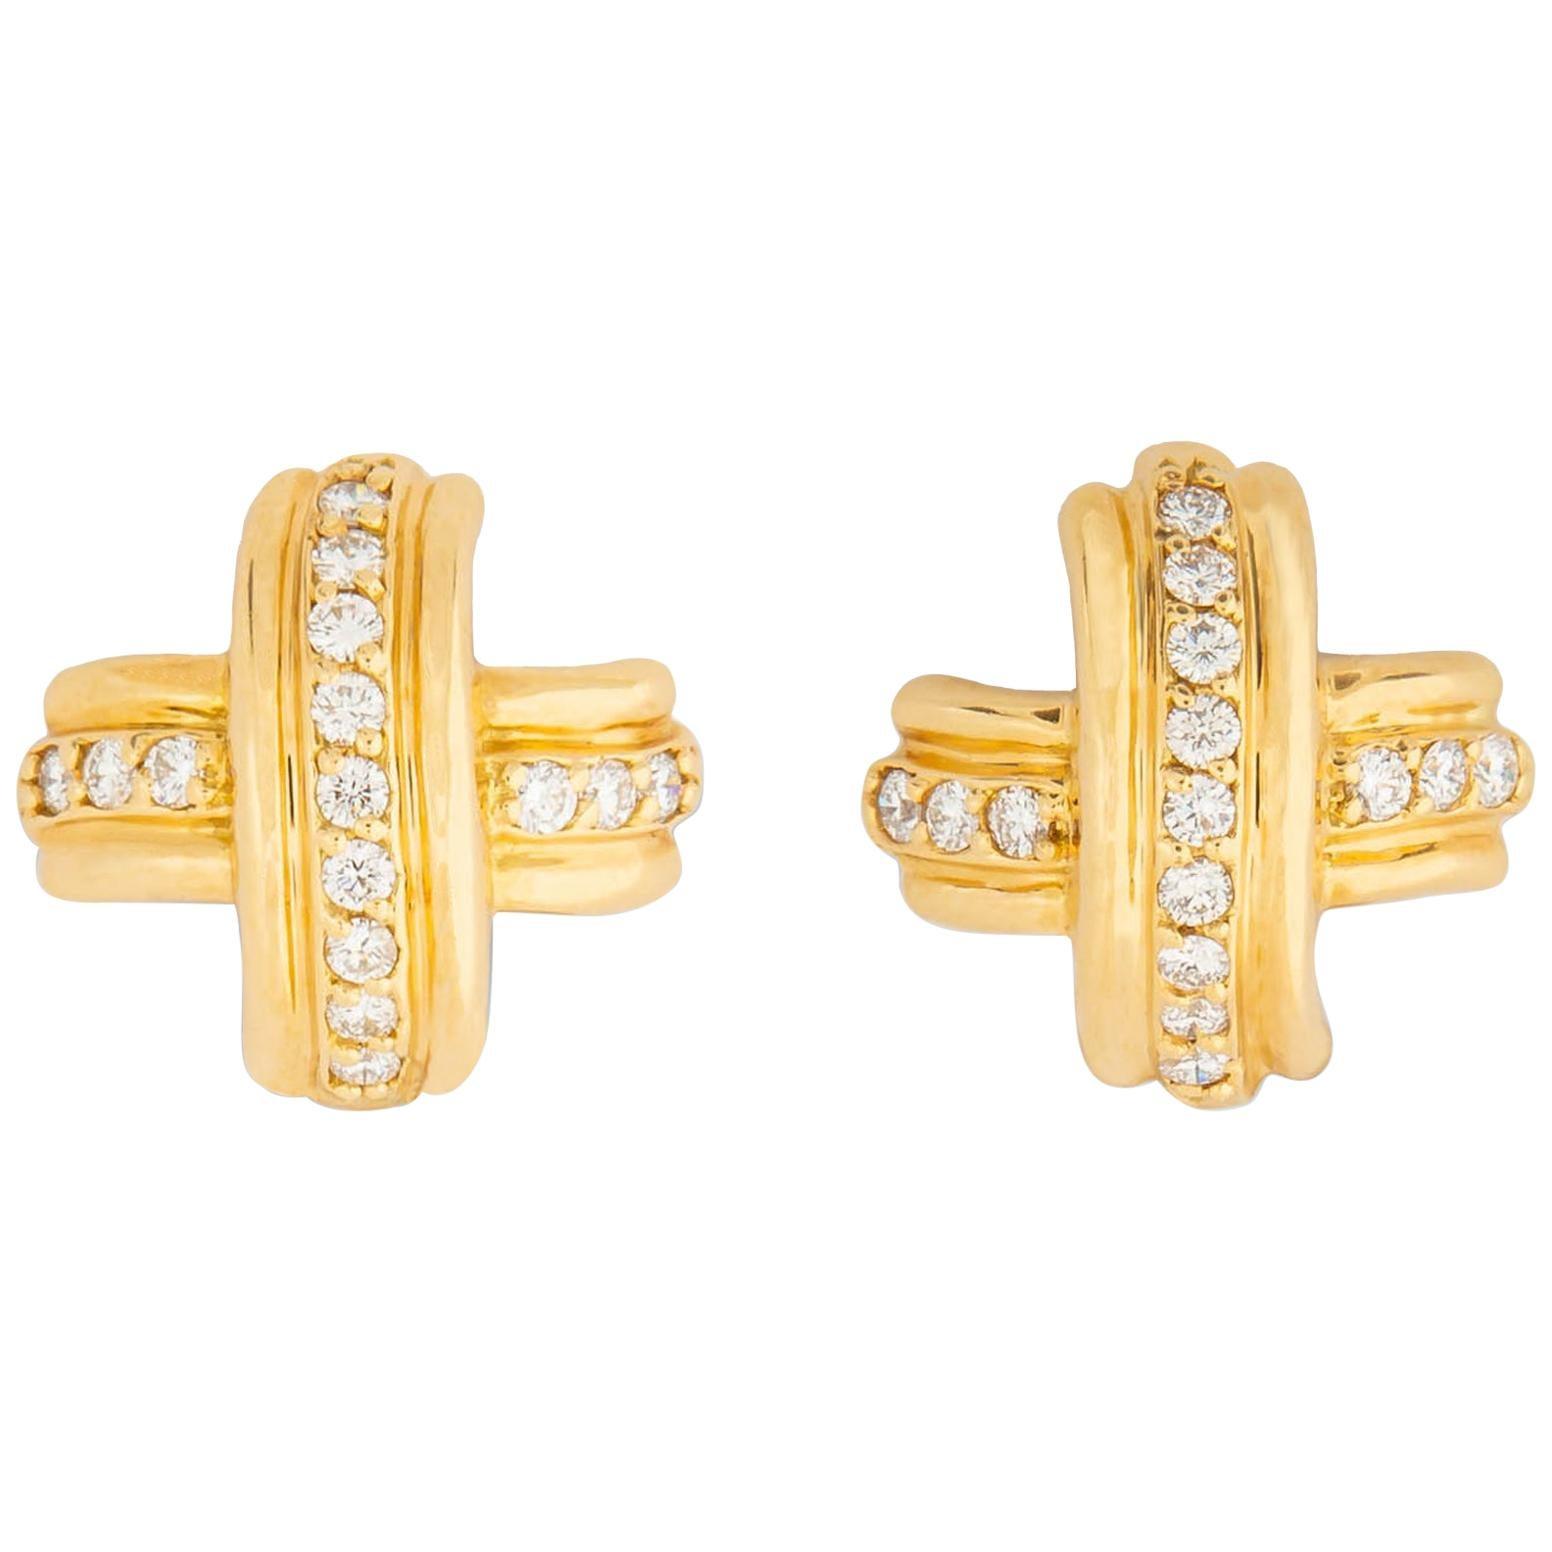 Tiffany & Co. Gold and Diamond Classic X Earrings